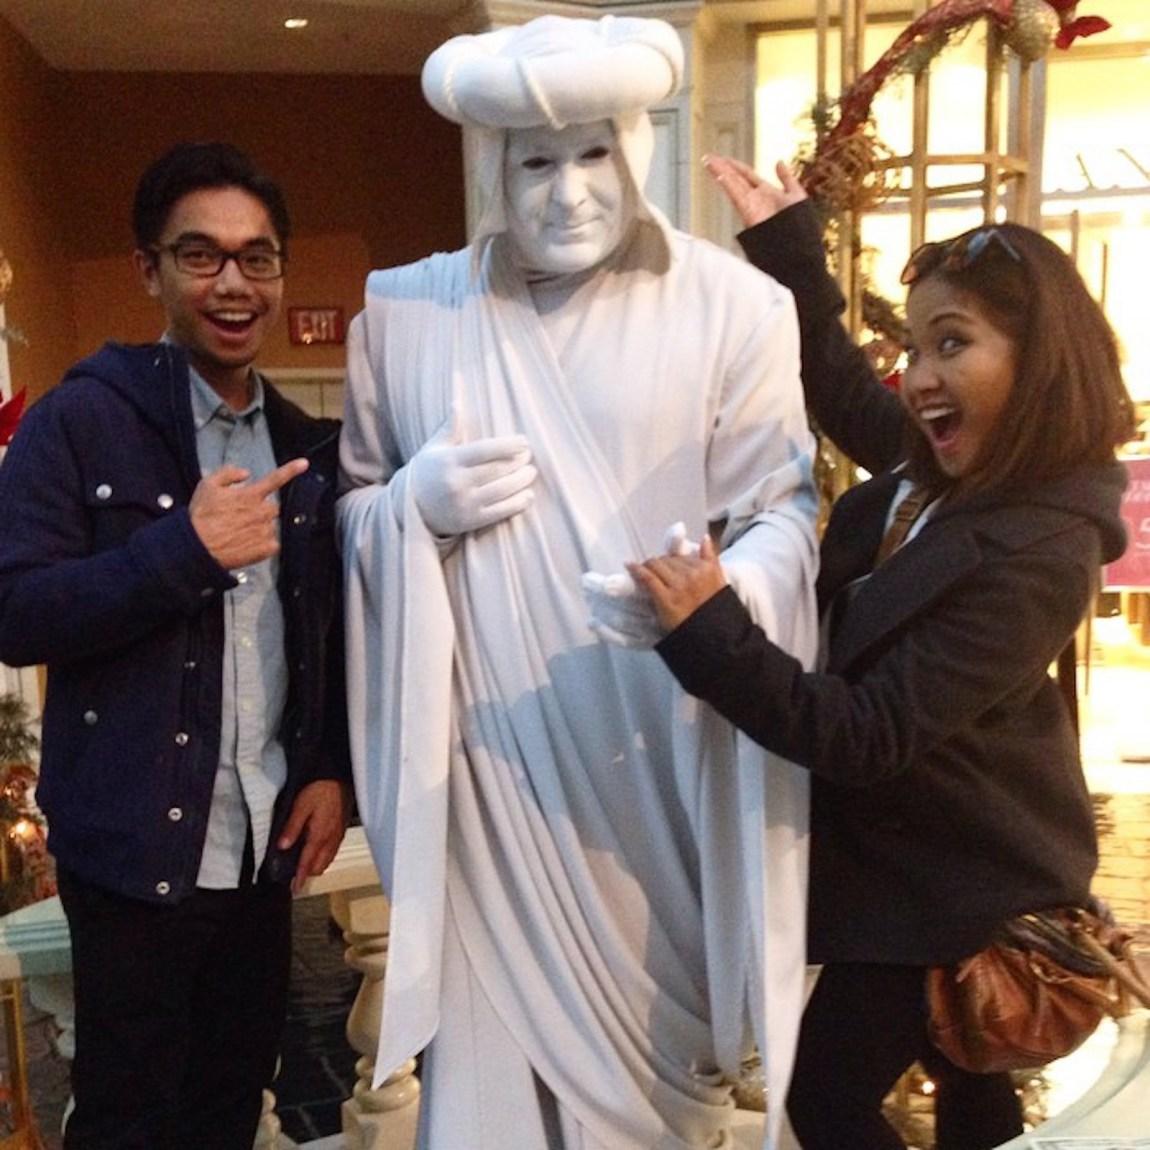 What did the Filipino say to the statue? estatue 😉